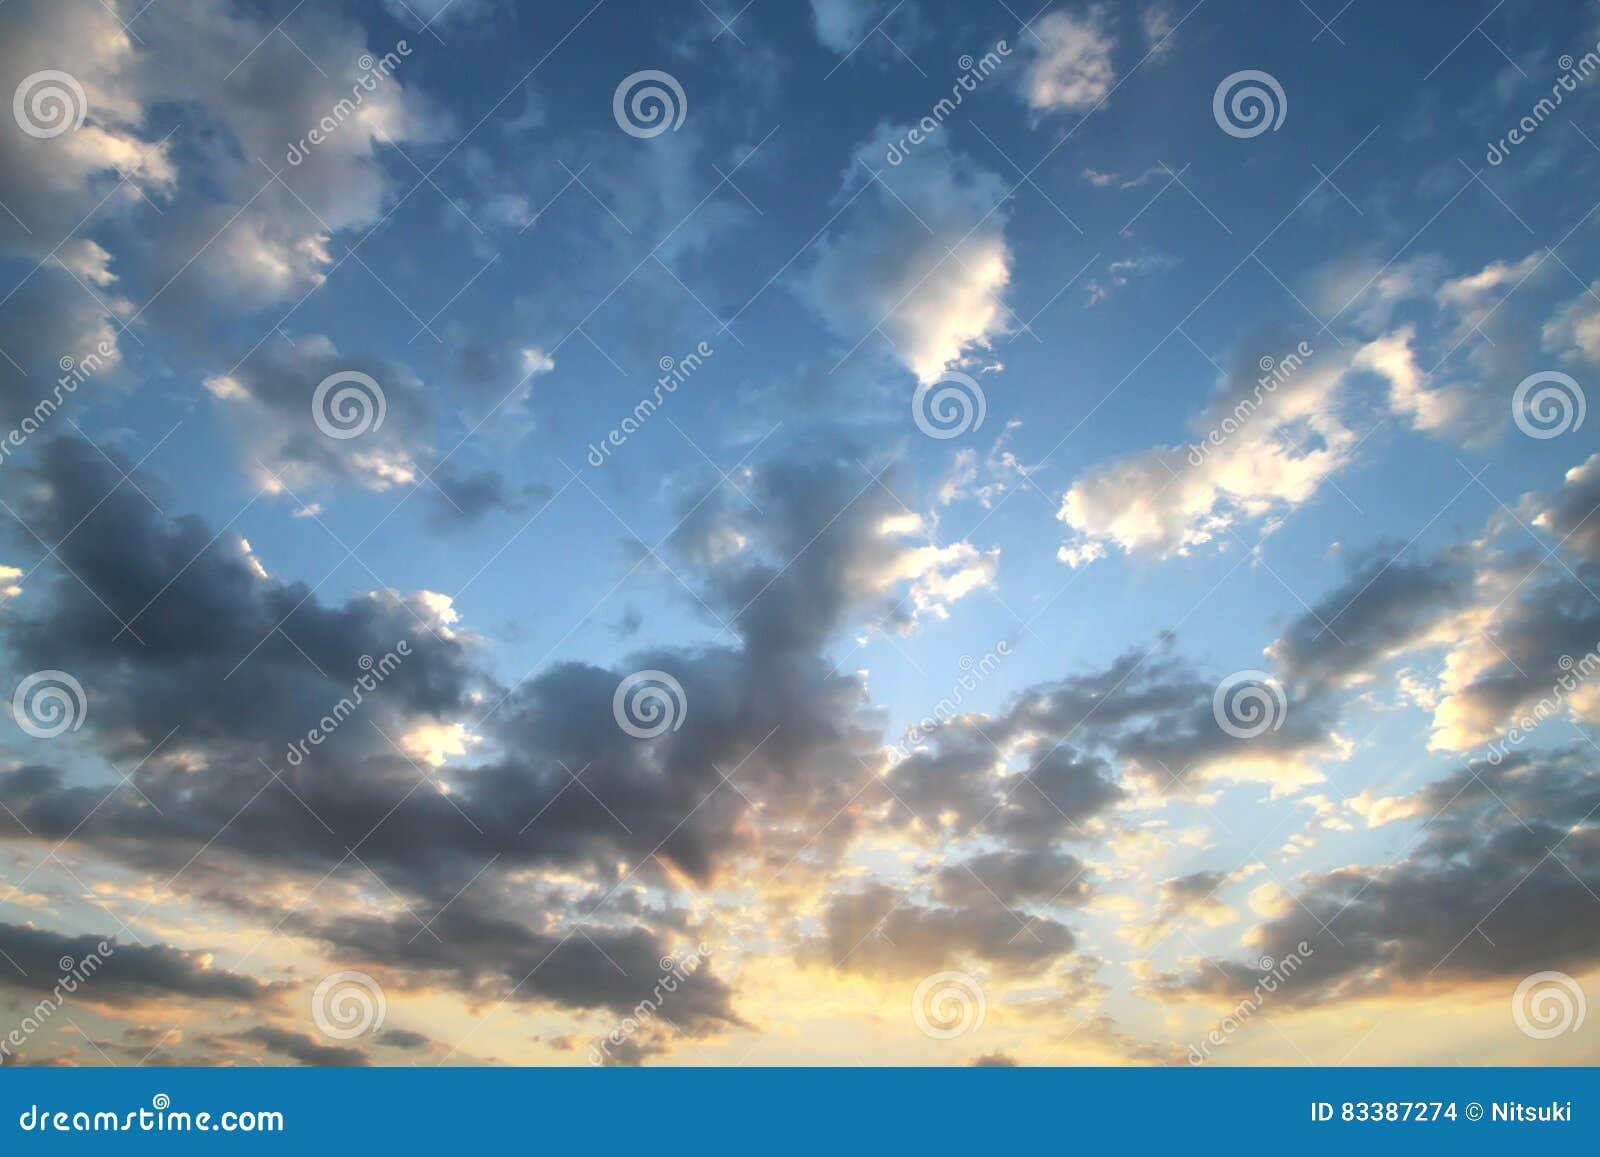 Sonnenuntergang blauer Himmel der Wolke